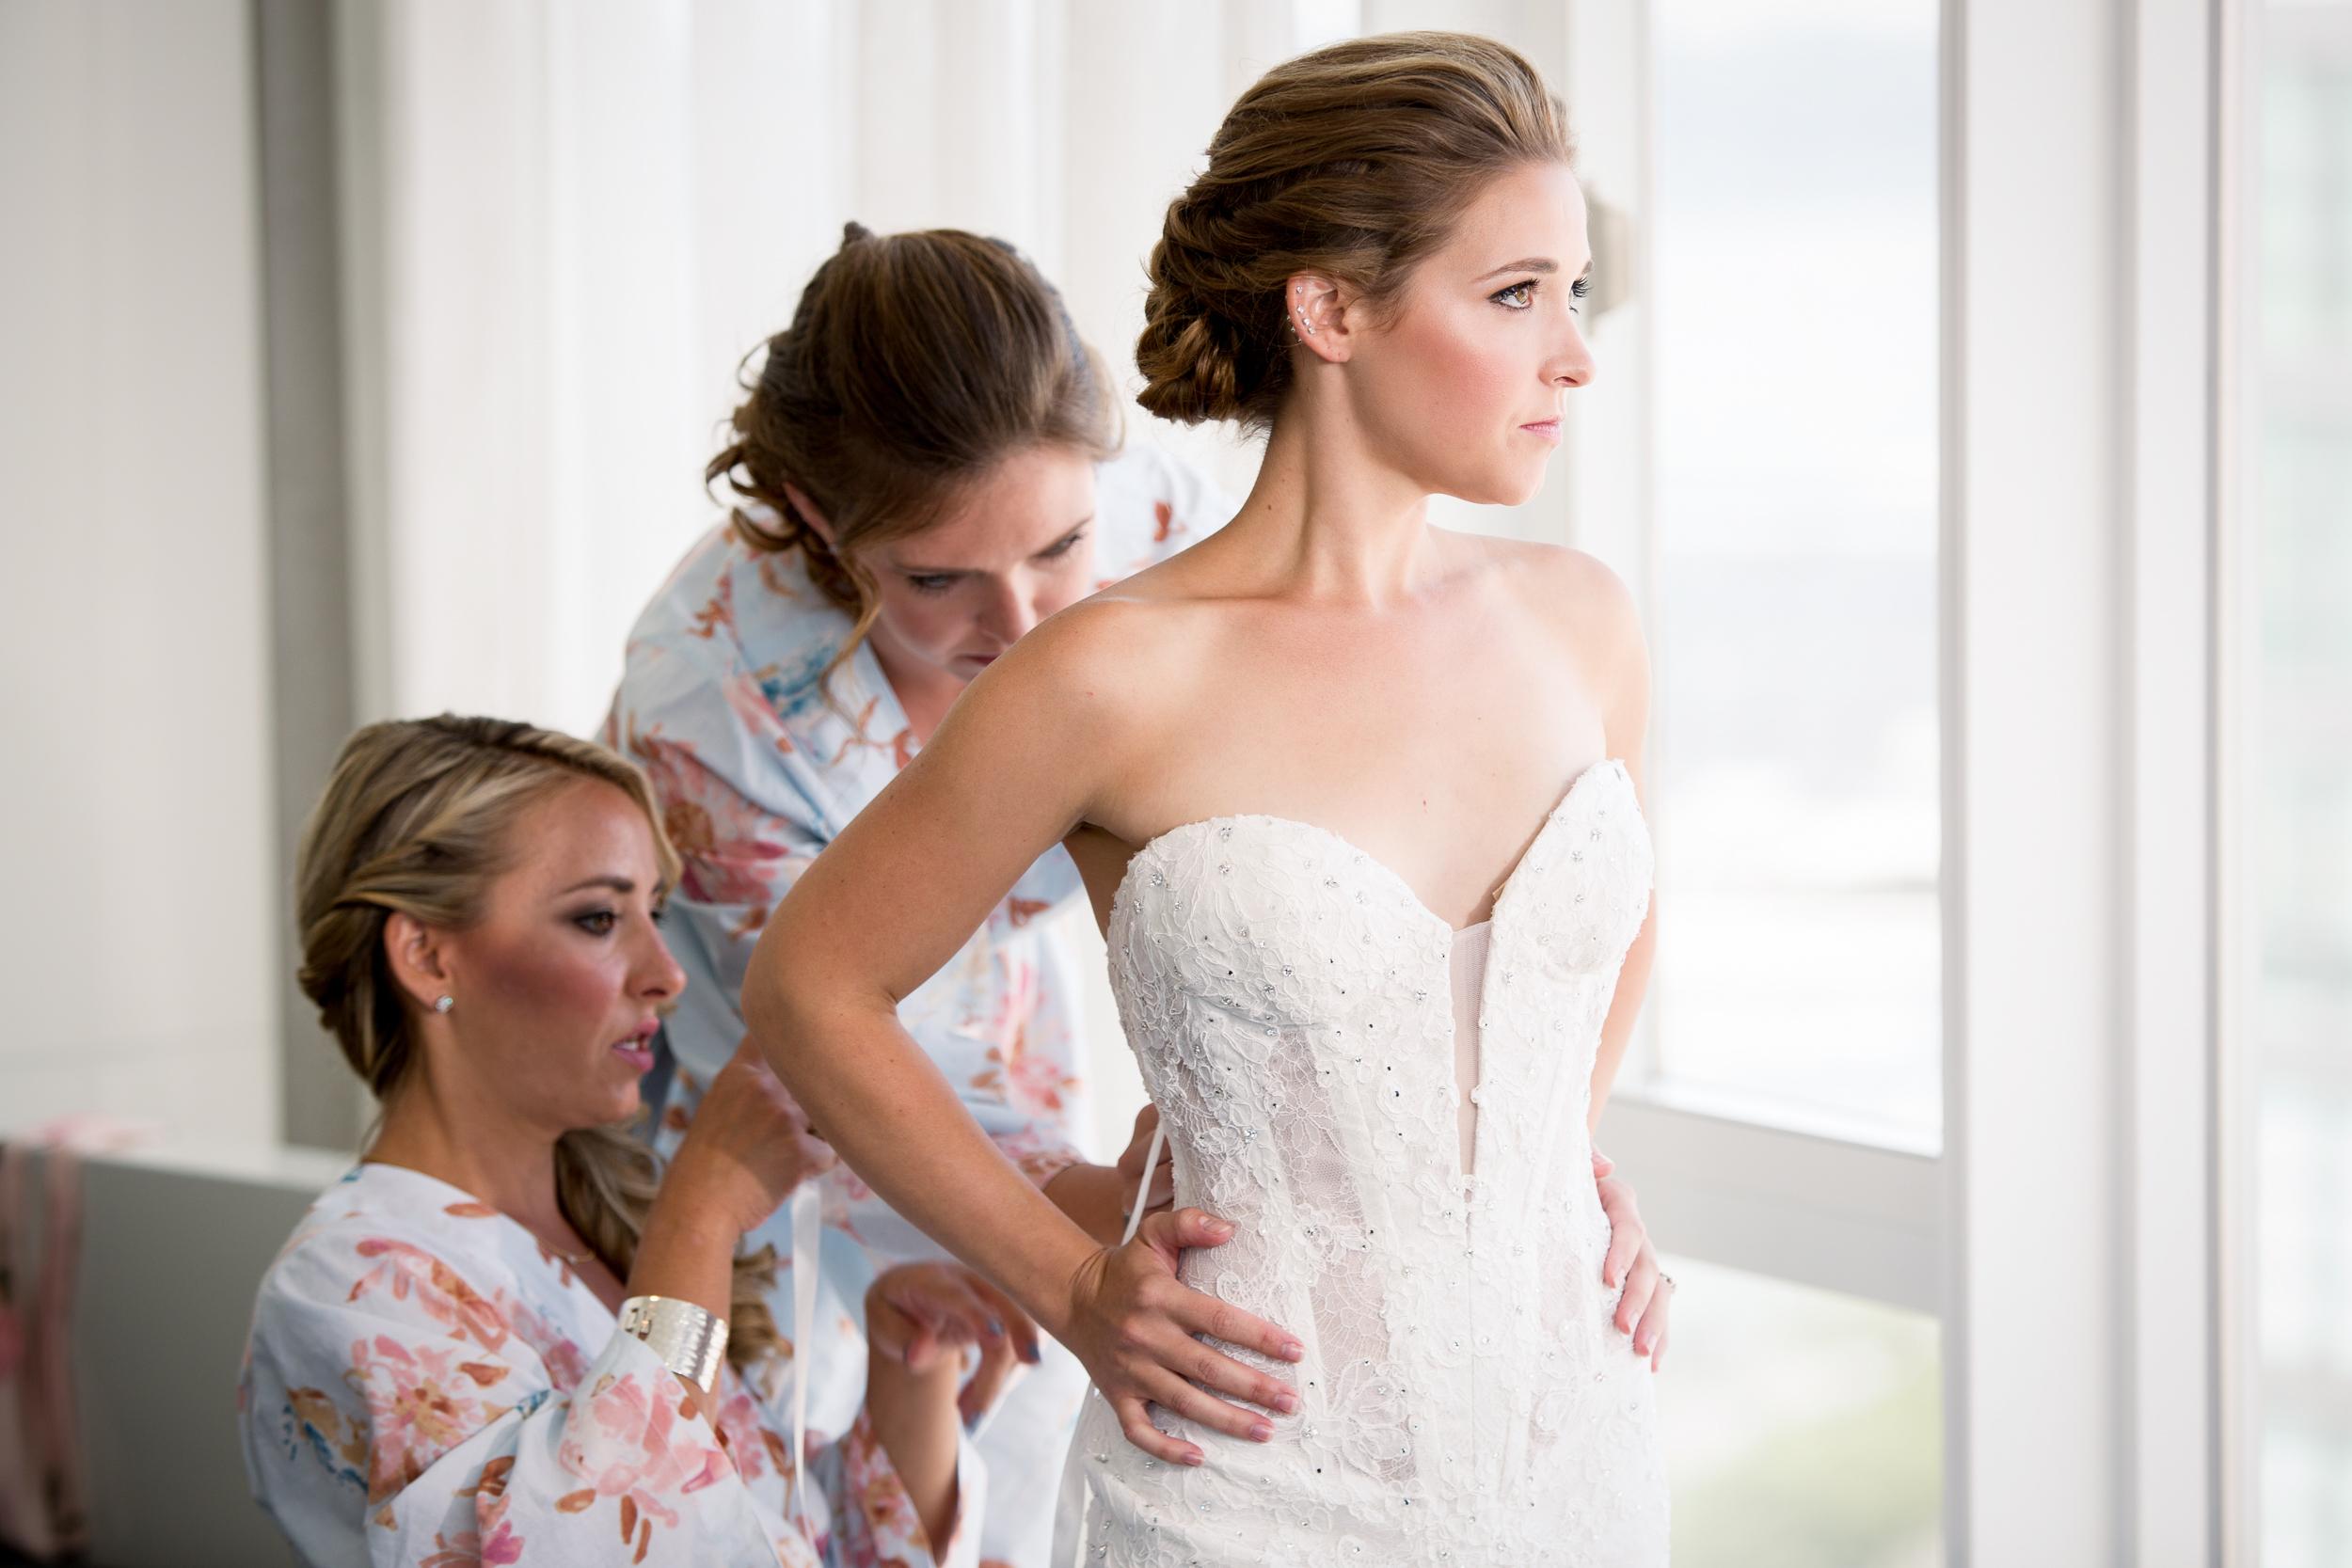 Ceci_New_York_Style_Luxury_Custom_Summer_Wedding_CeciBride_Letterpress_NewYork_Foil_Lighthouse_Chelsea_Piers_5.jpg